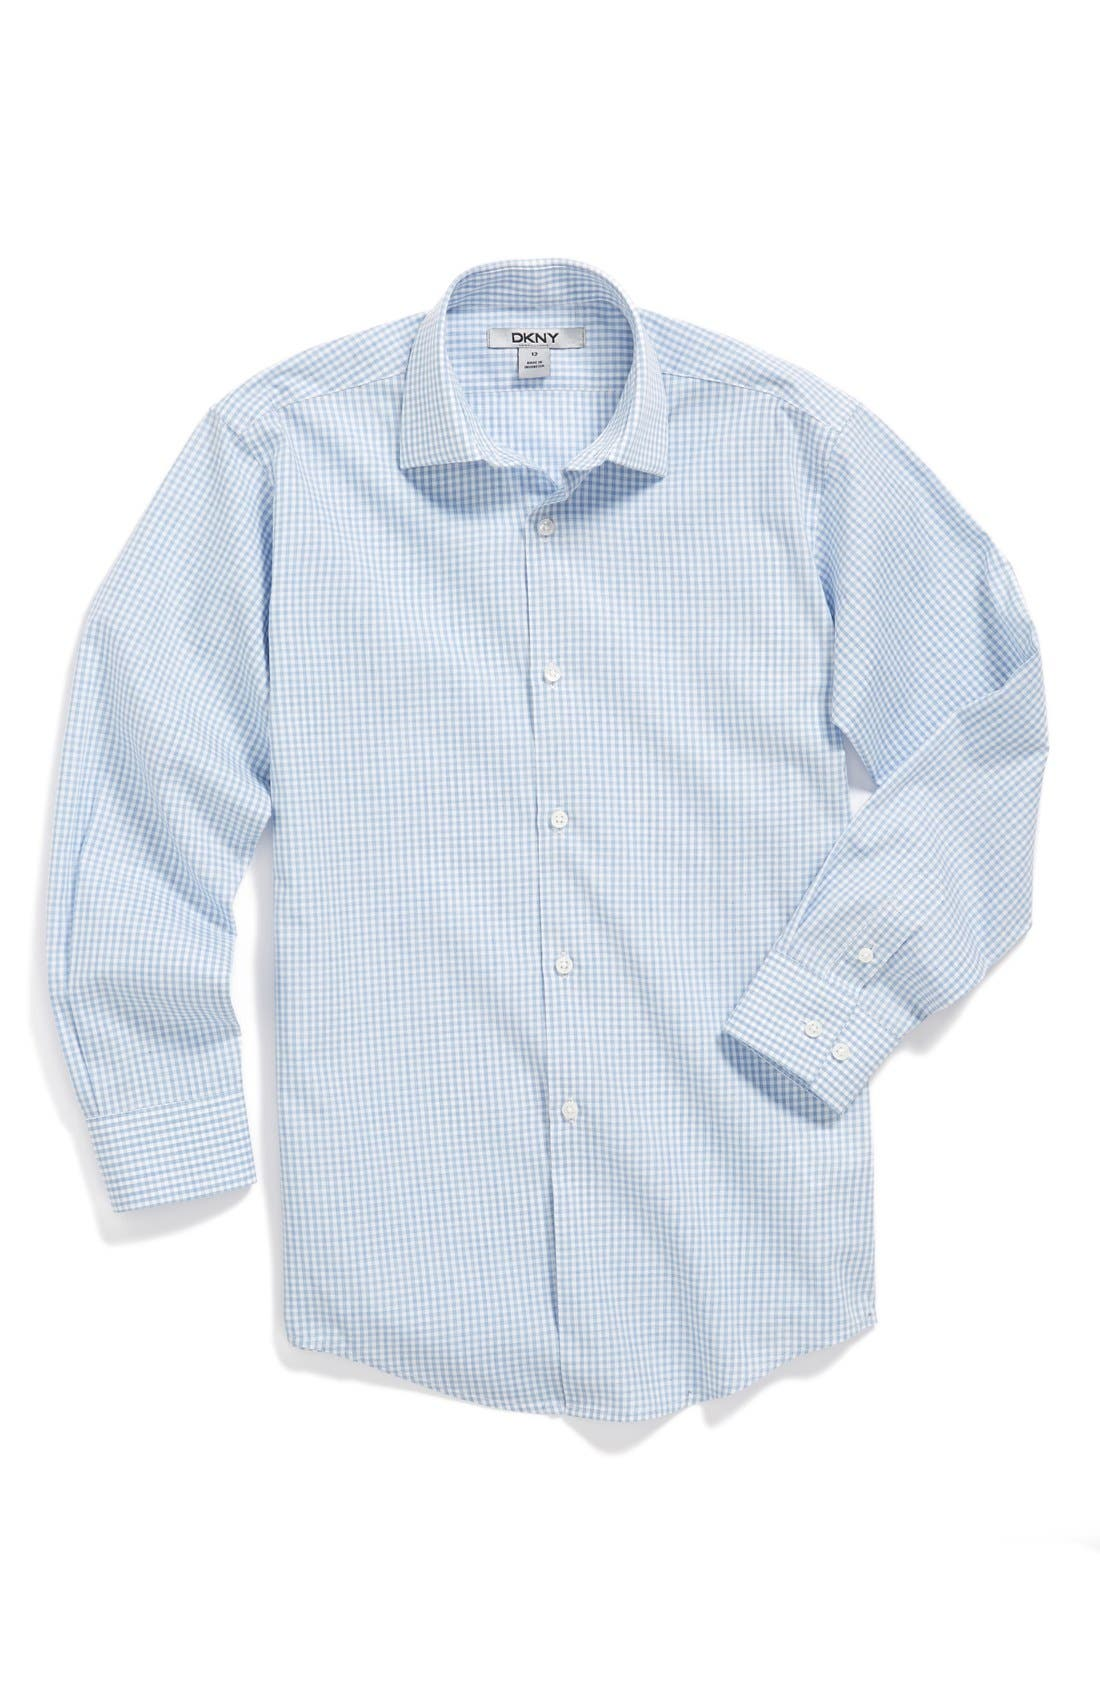 Alternate Image 1 Selected - DKNY Check Dress Shirt (Big Boys)